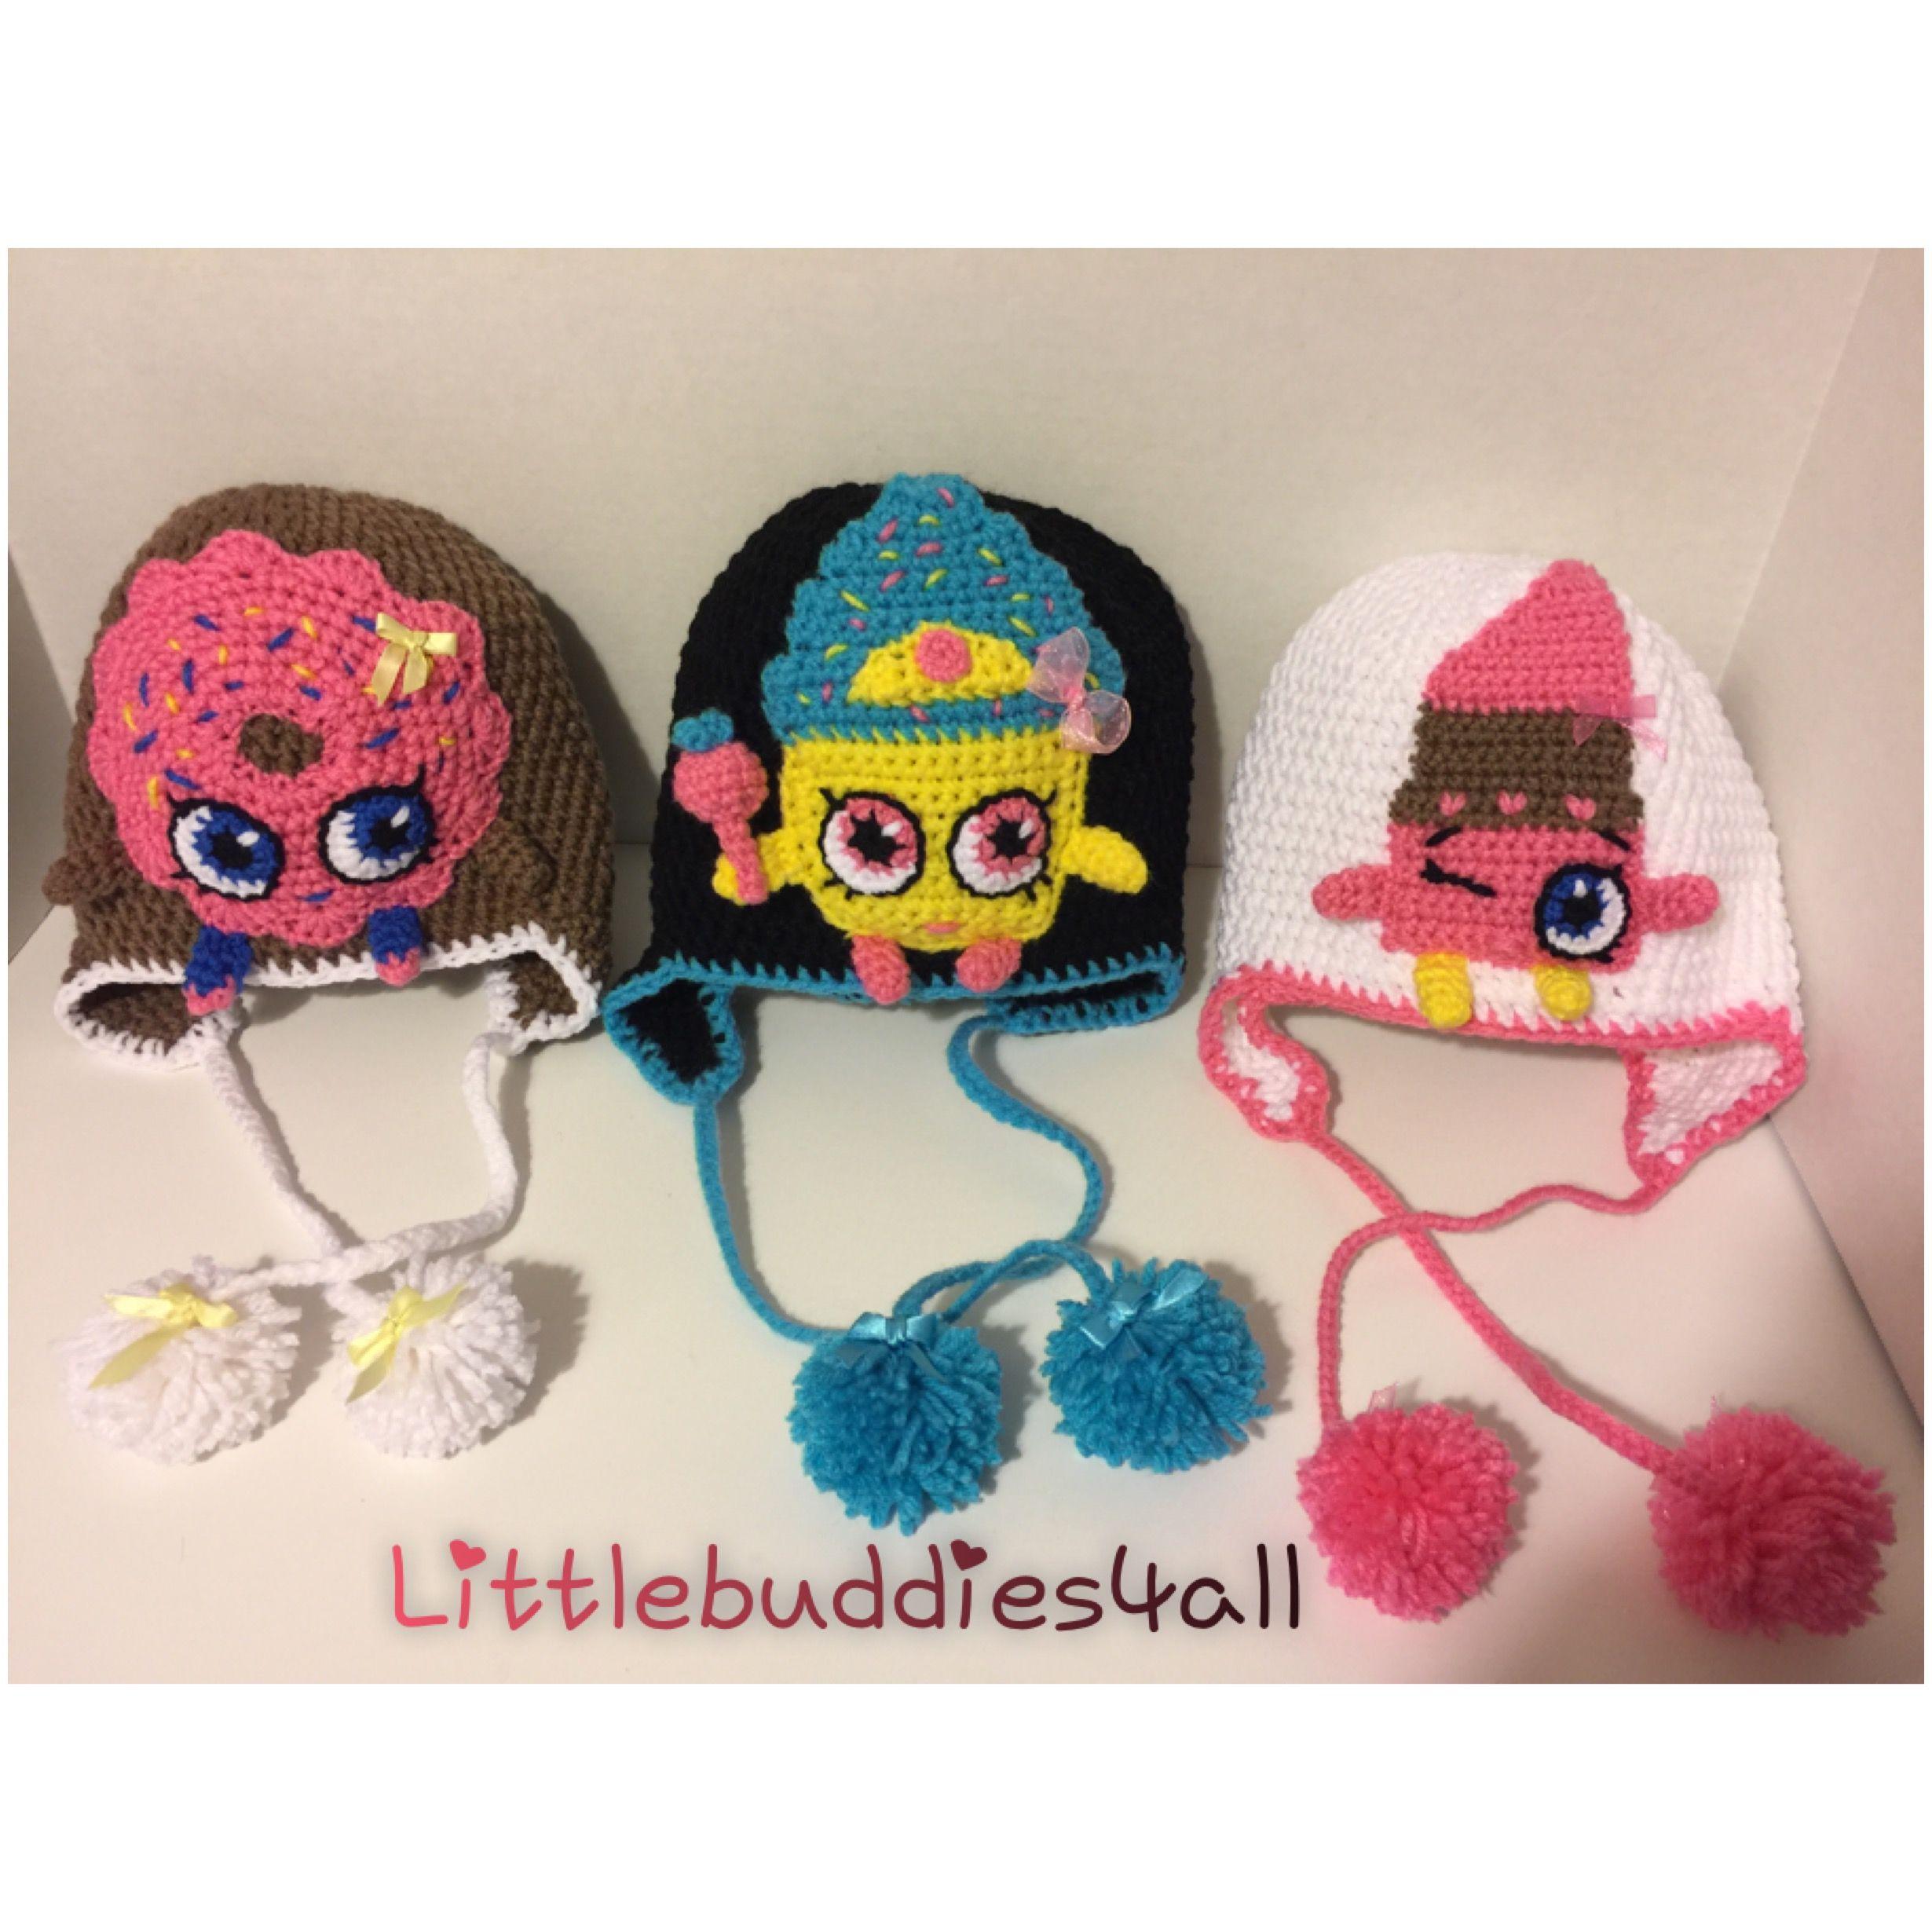 Shopkin crochet hats lippy lip queen cupcake and donut shopkin crochet hats lippy lip queen cupcake and donut littlebuddies4all bankloansurffo Images